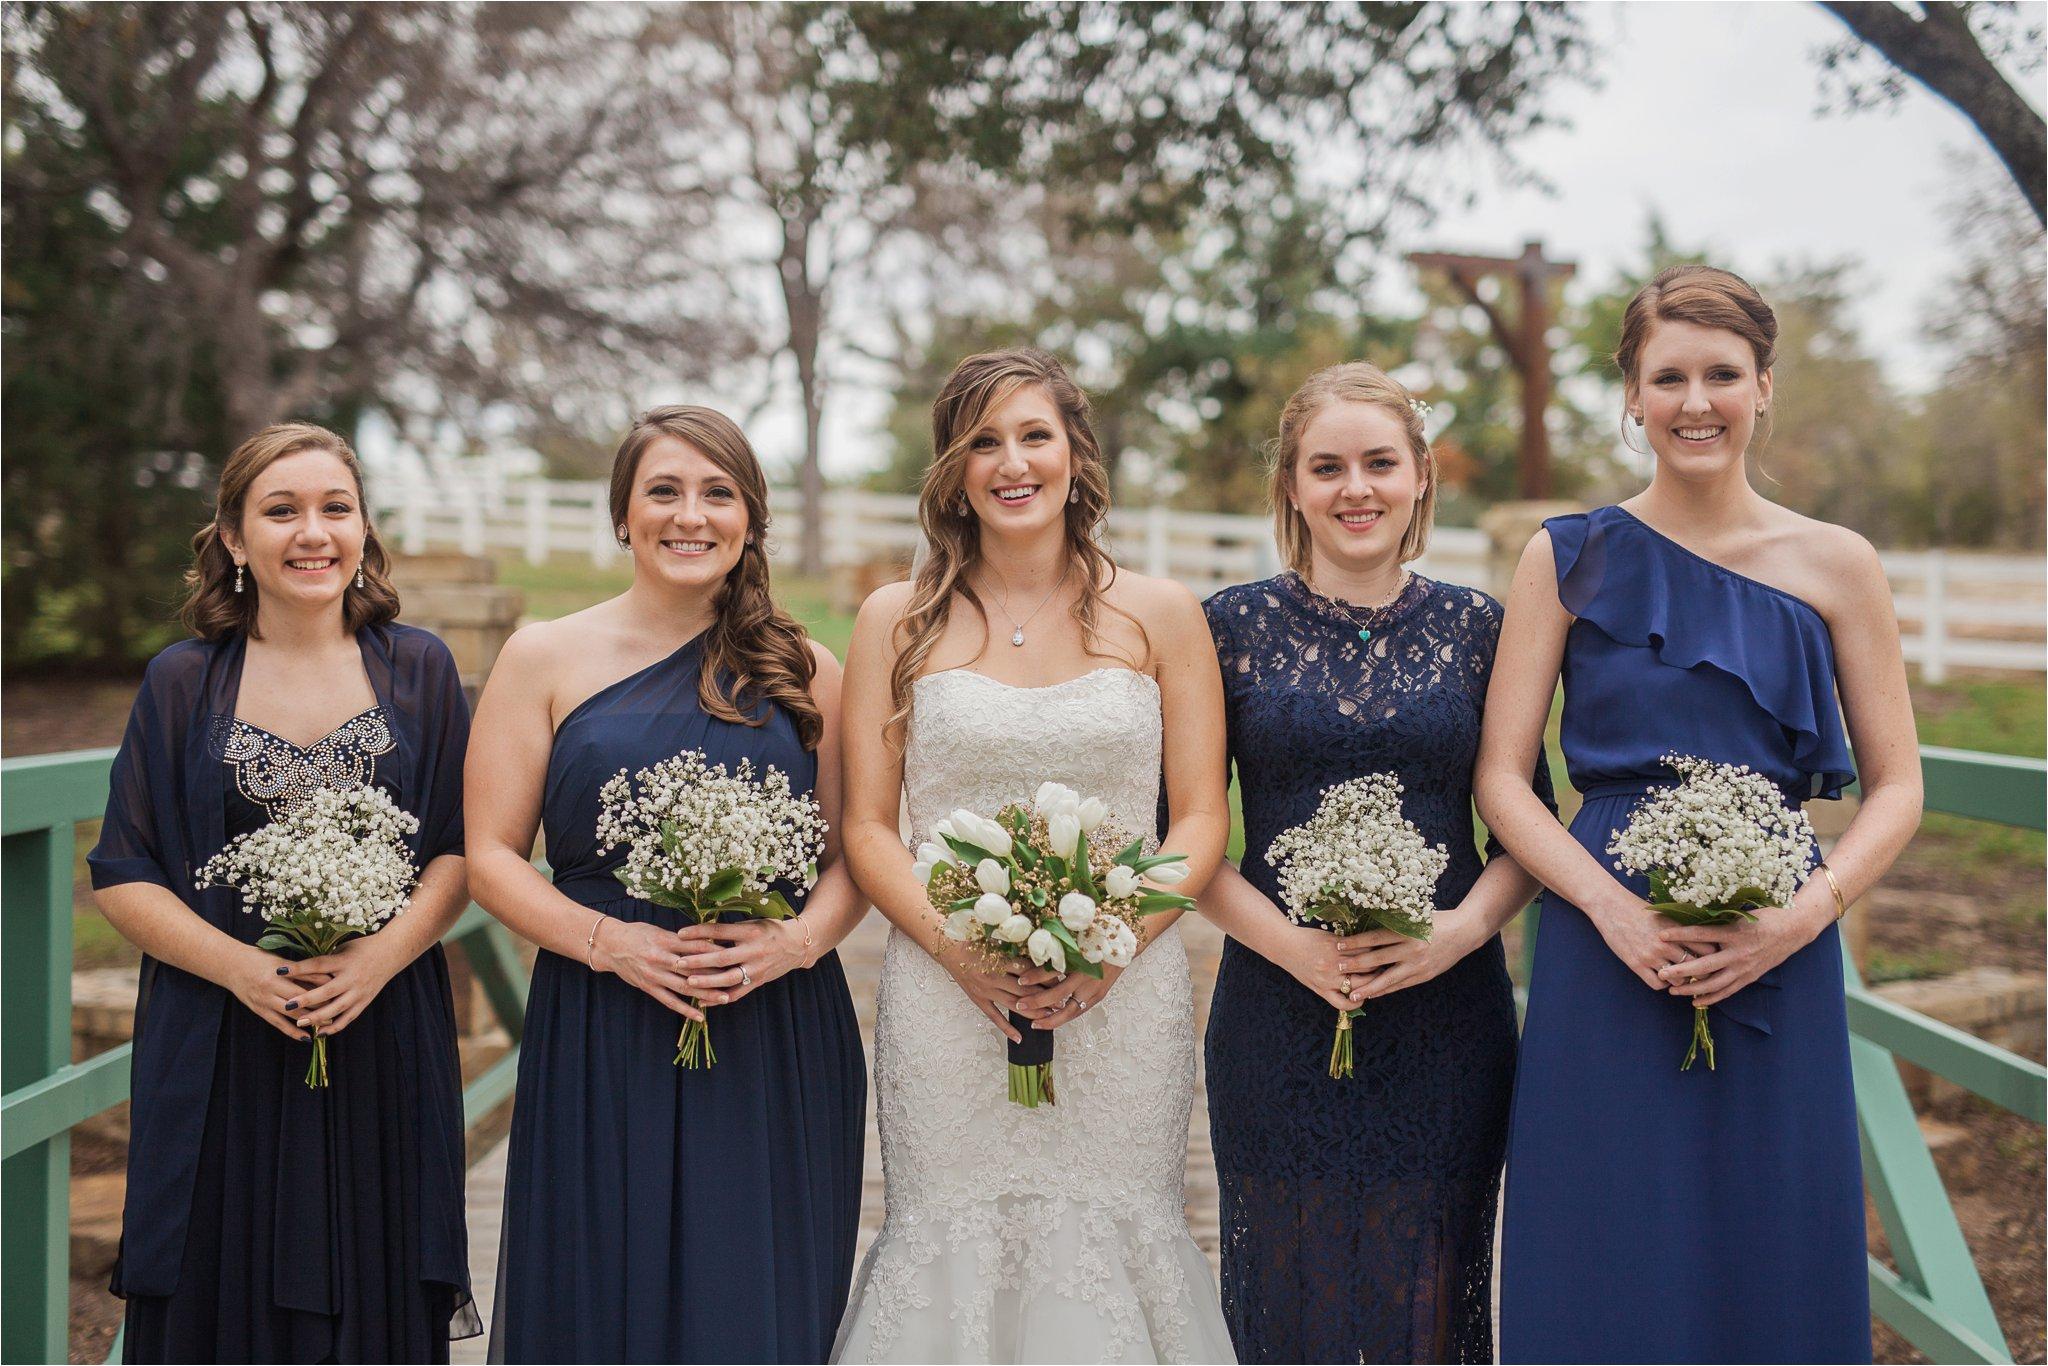 lunsford-wedding-175.jpg